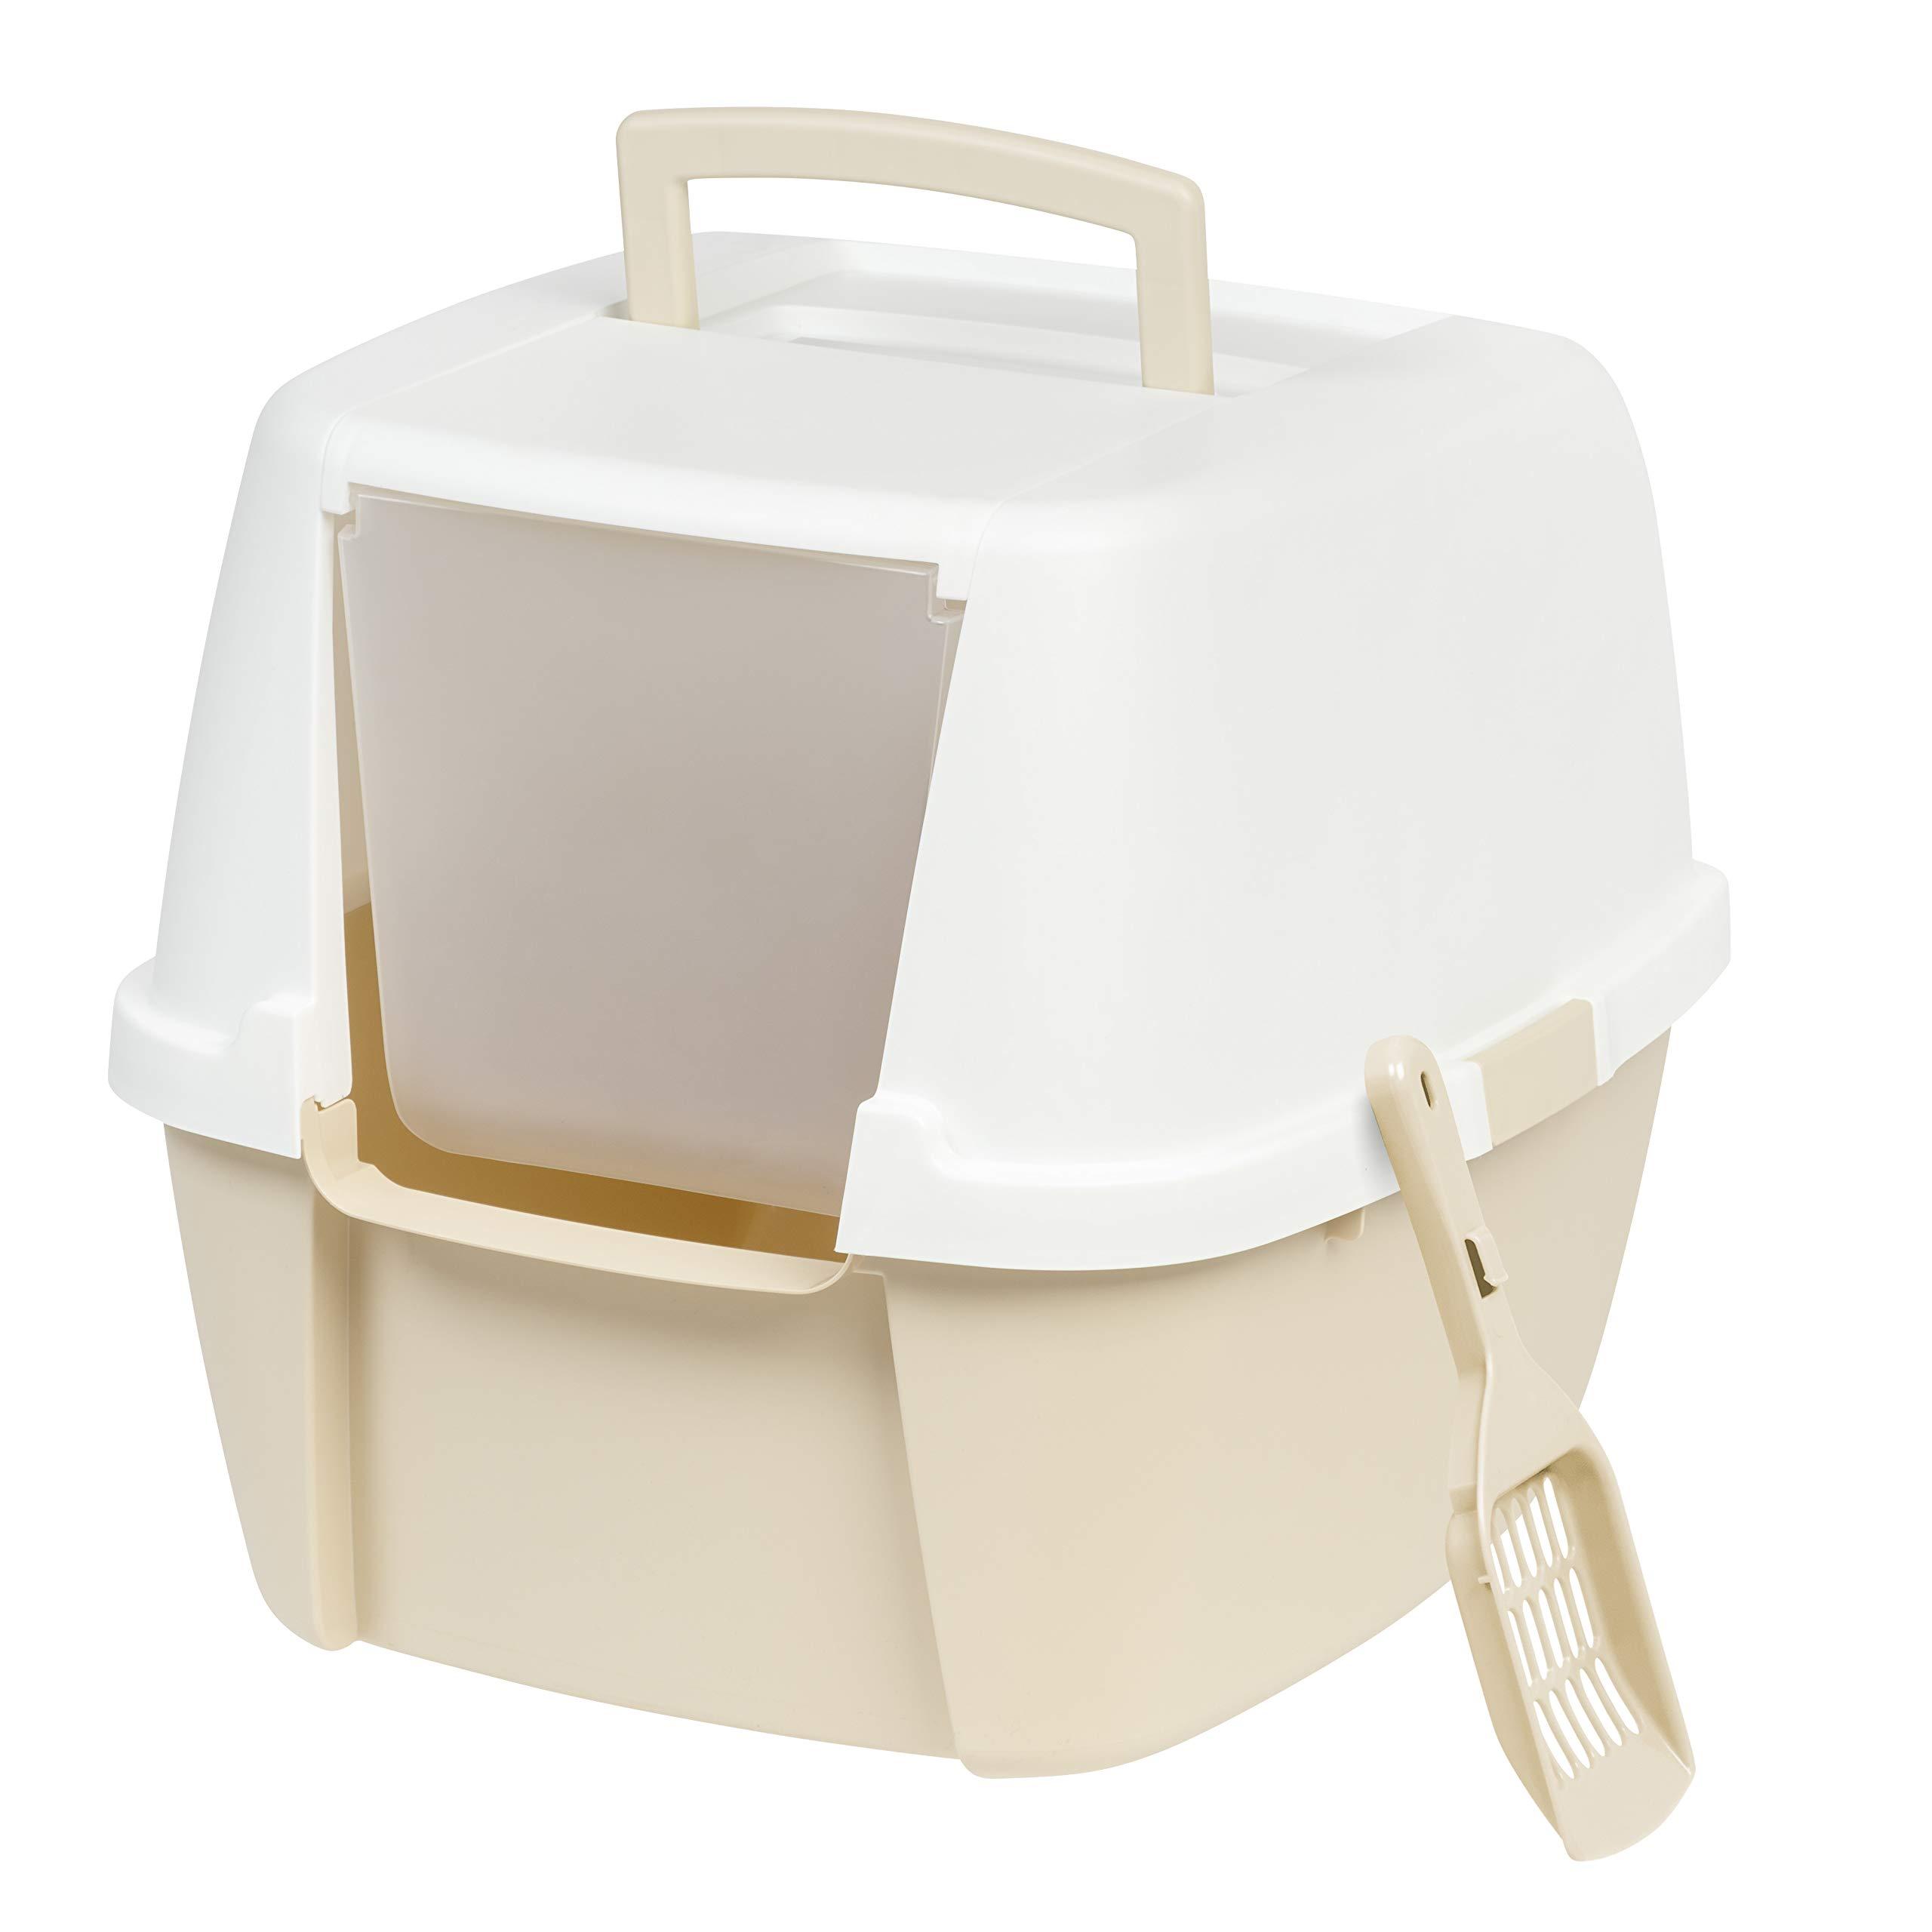 IRIS Jumbo Hooded Litter Box with Scoop, Almond by IRIS USA, Inc.